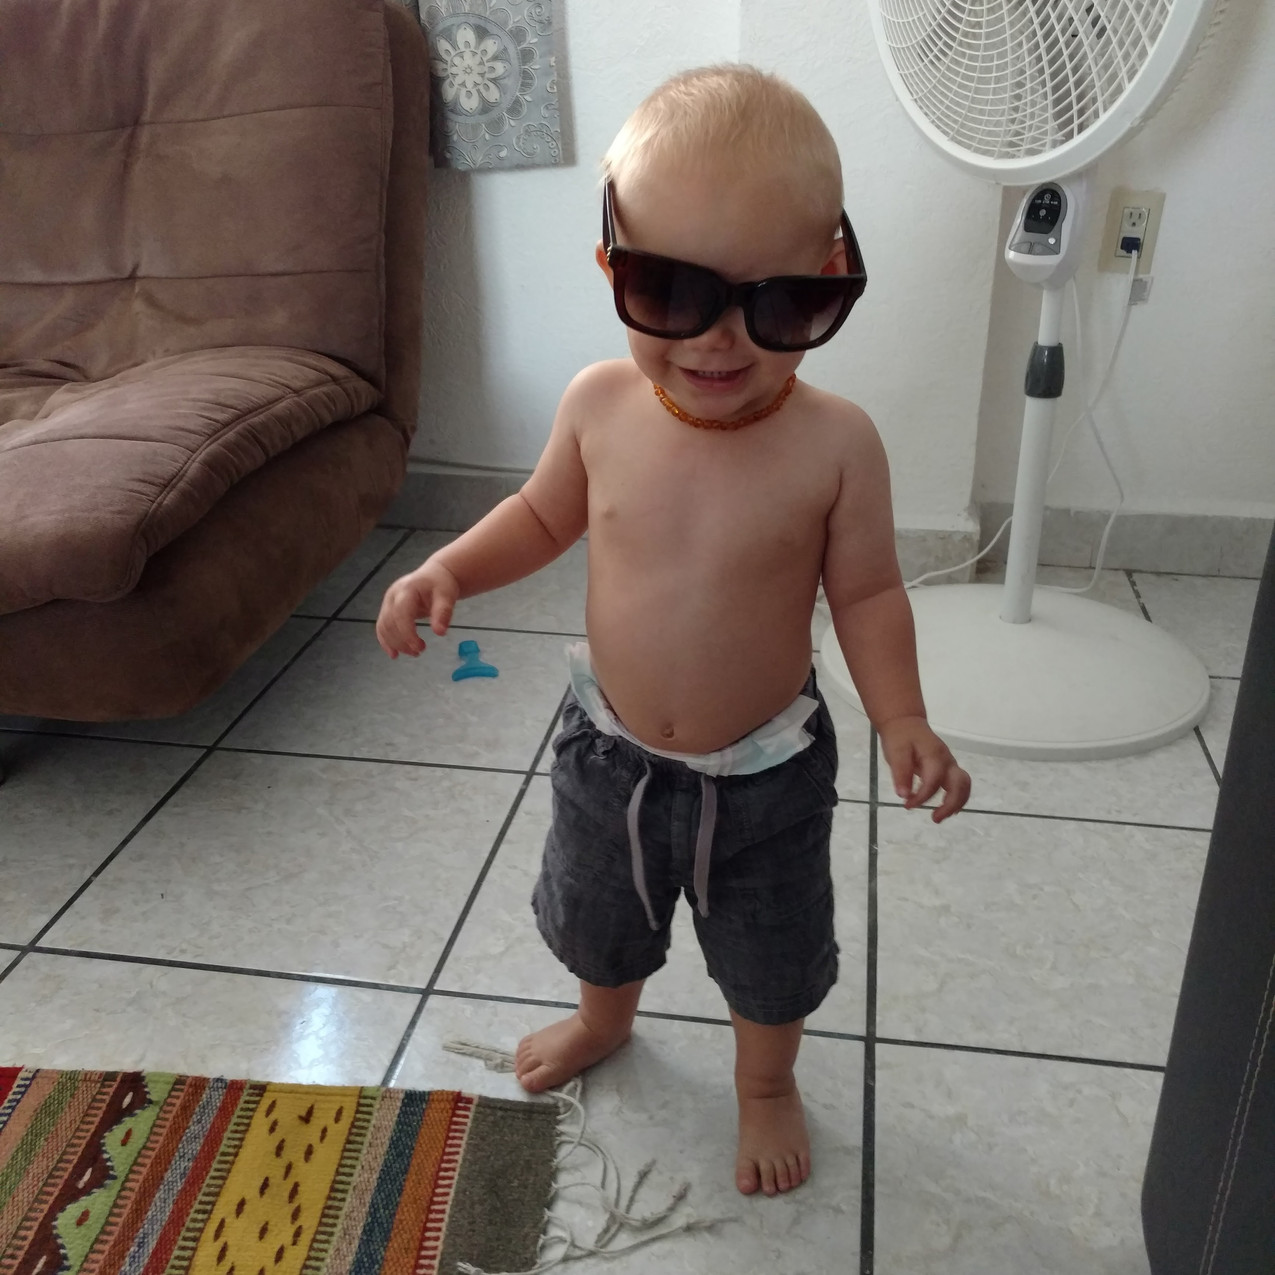 Gideon thinks he's cool